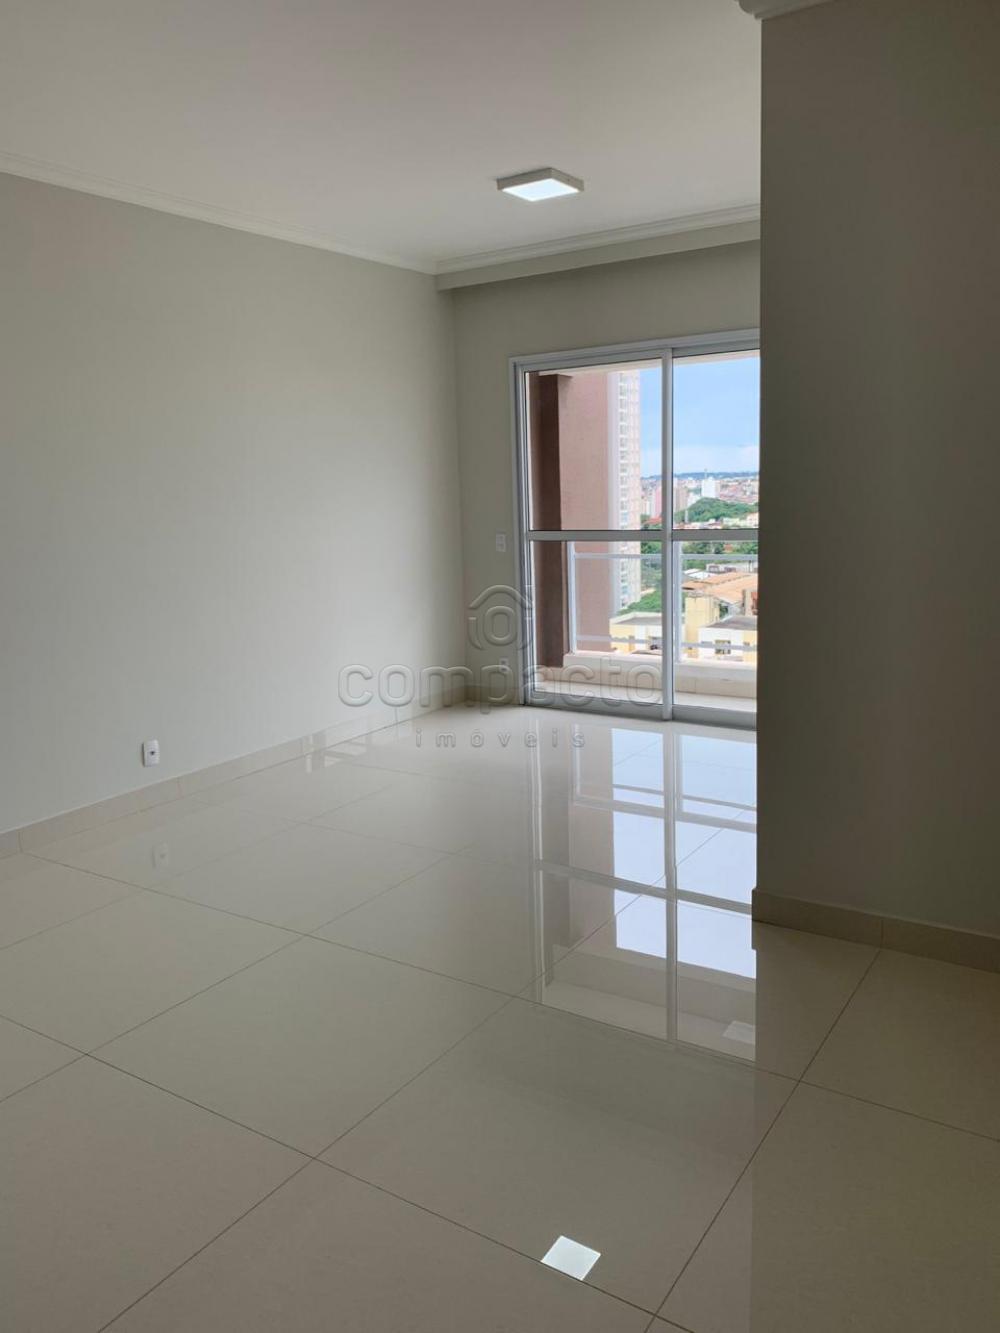 Sao Jose do Rio Preto Apartamento Venda R$560.000,00 Condominio R$390,00 2 Dormitorios 1 Suite Area construida 77.00m2